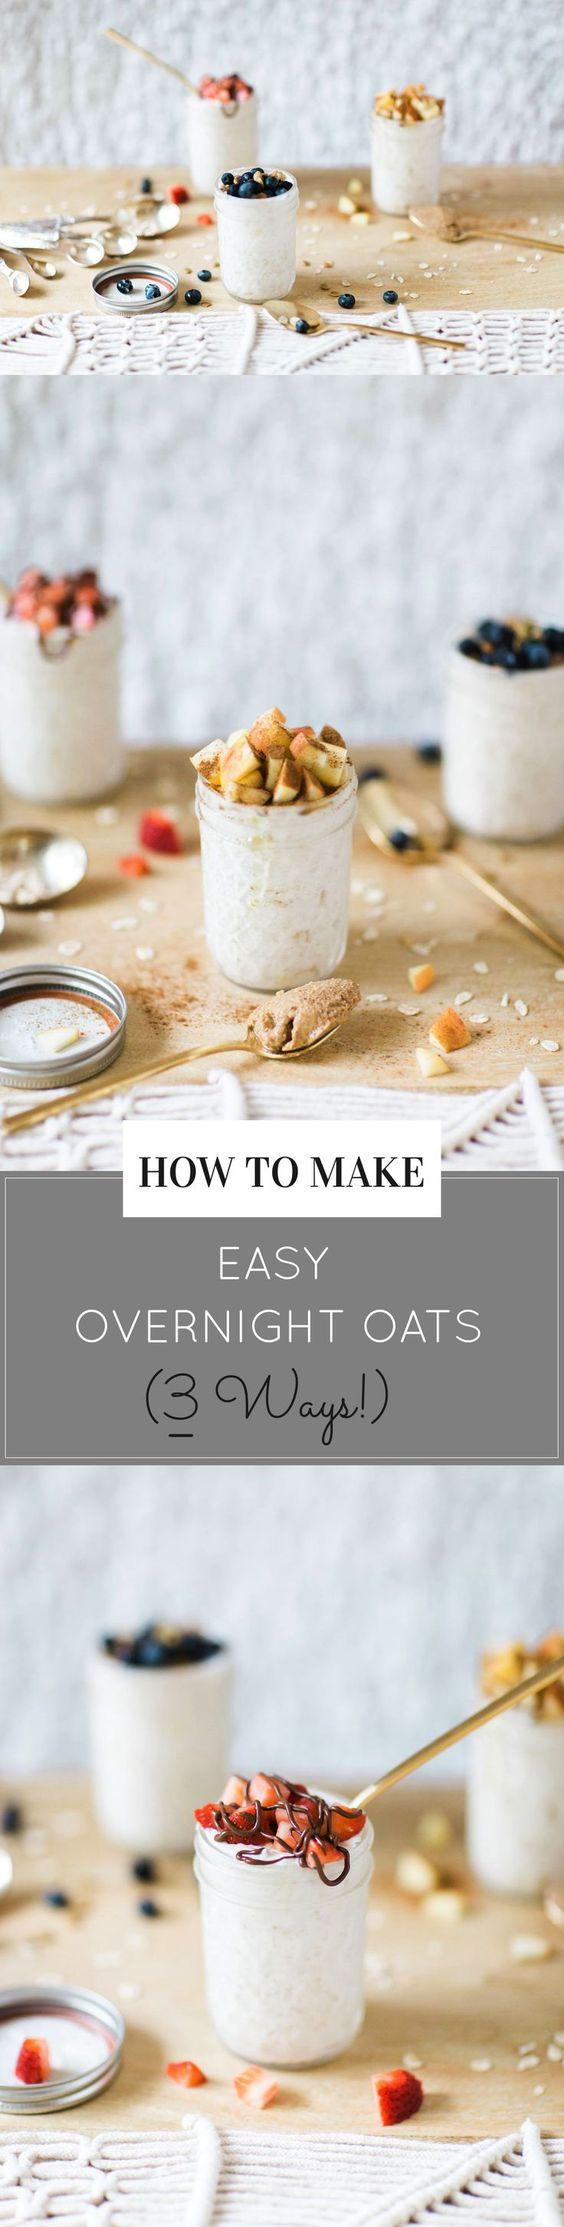 How to Make Easy Overnight Oats (3 Ways!)   overnight oats recipes   recipes for overnight oats   healthy breakfast recipes   easy breakfast recipes   recipes using oats    Glitter, Inc.